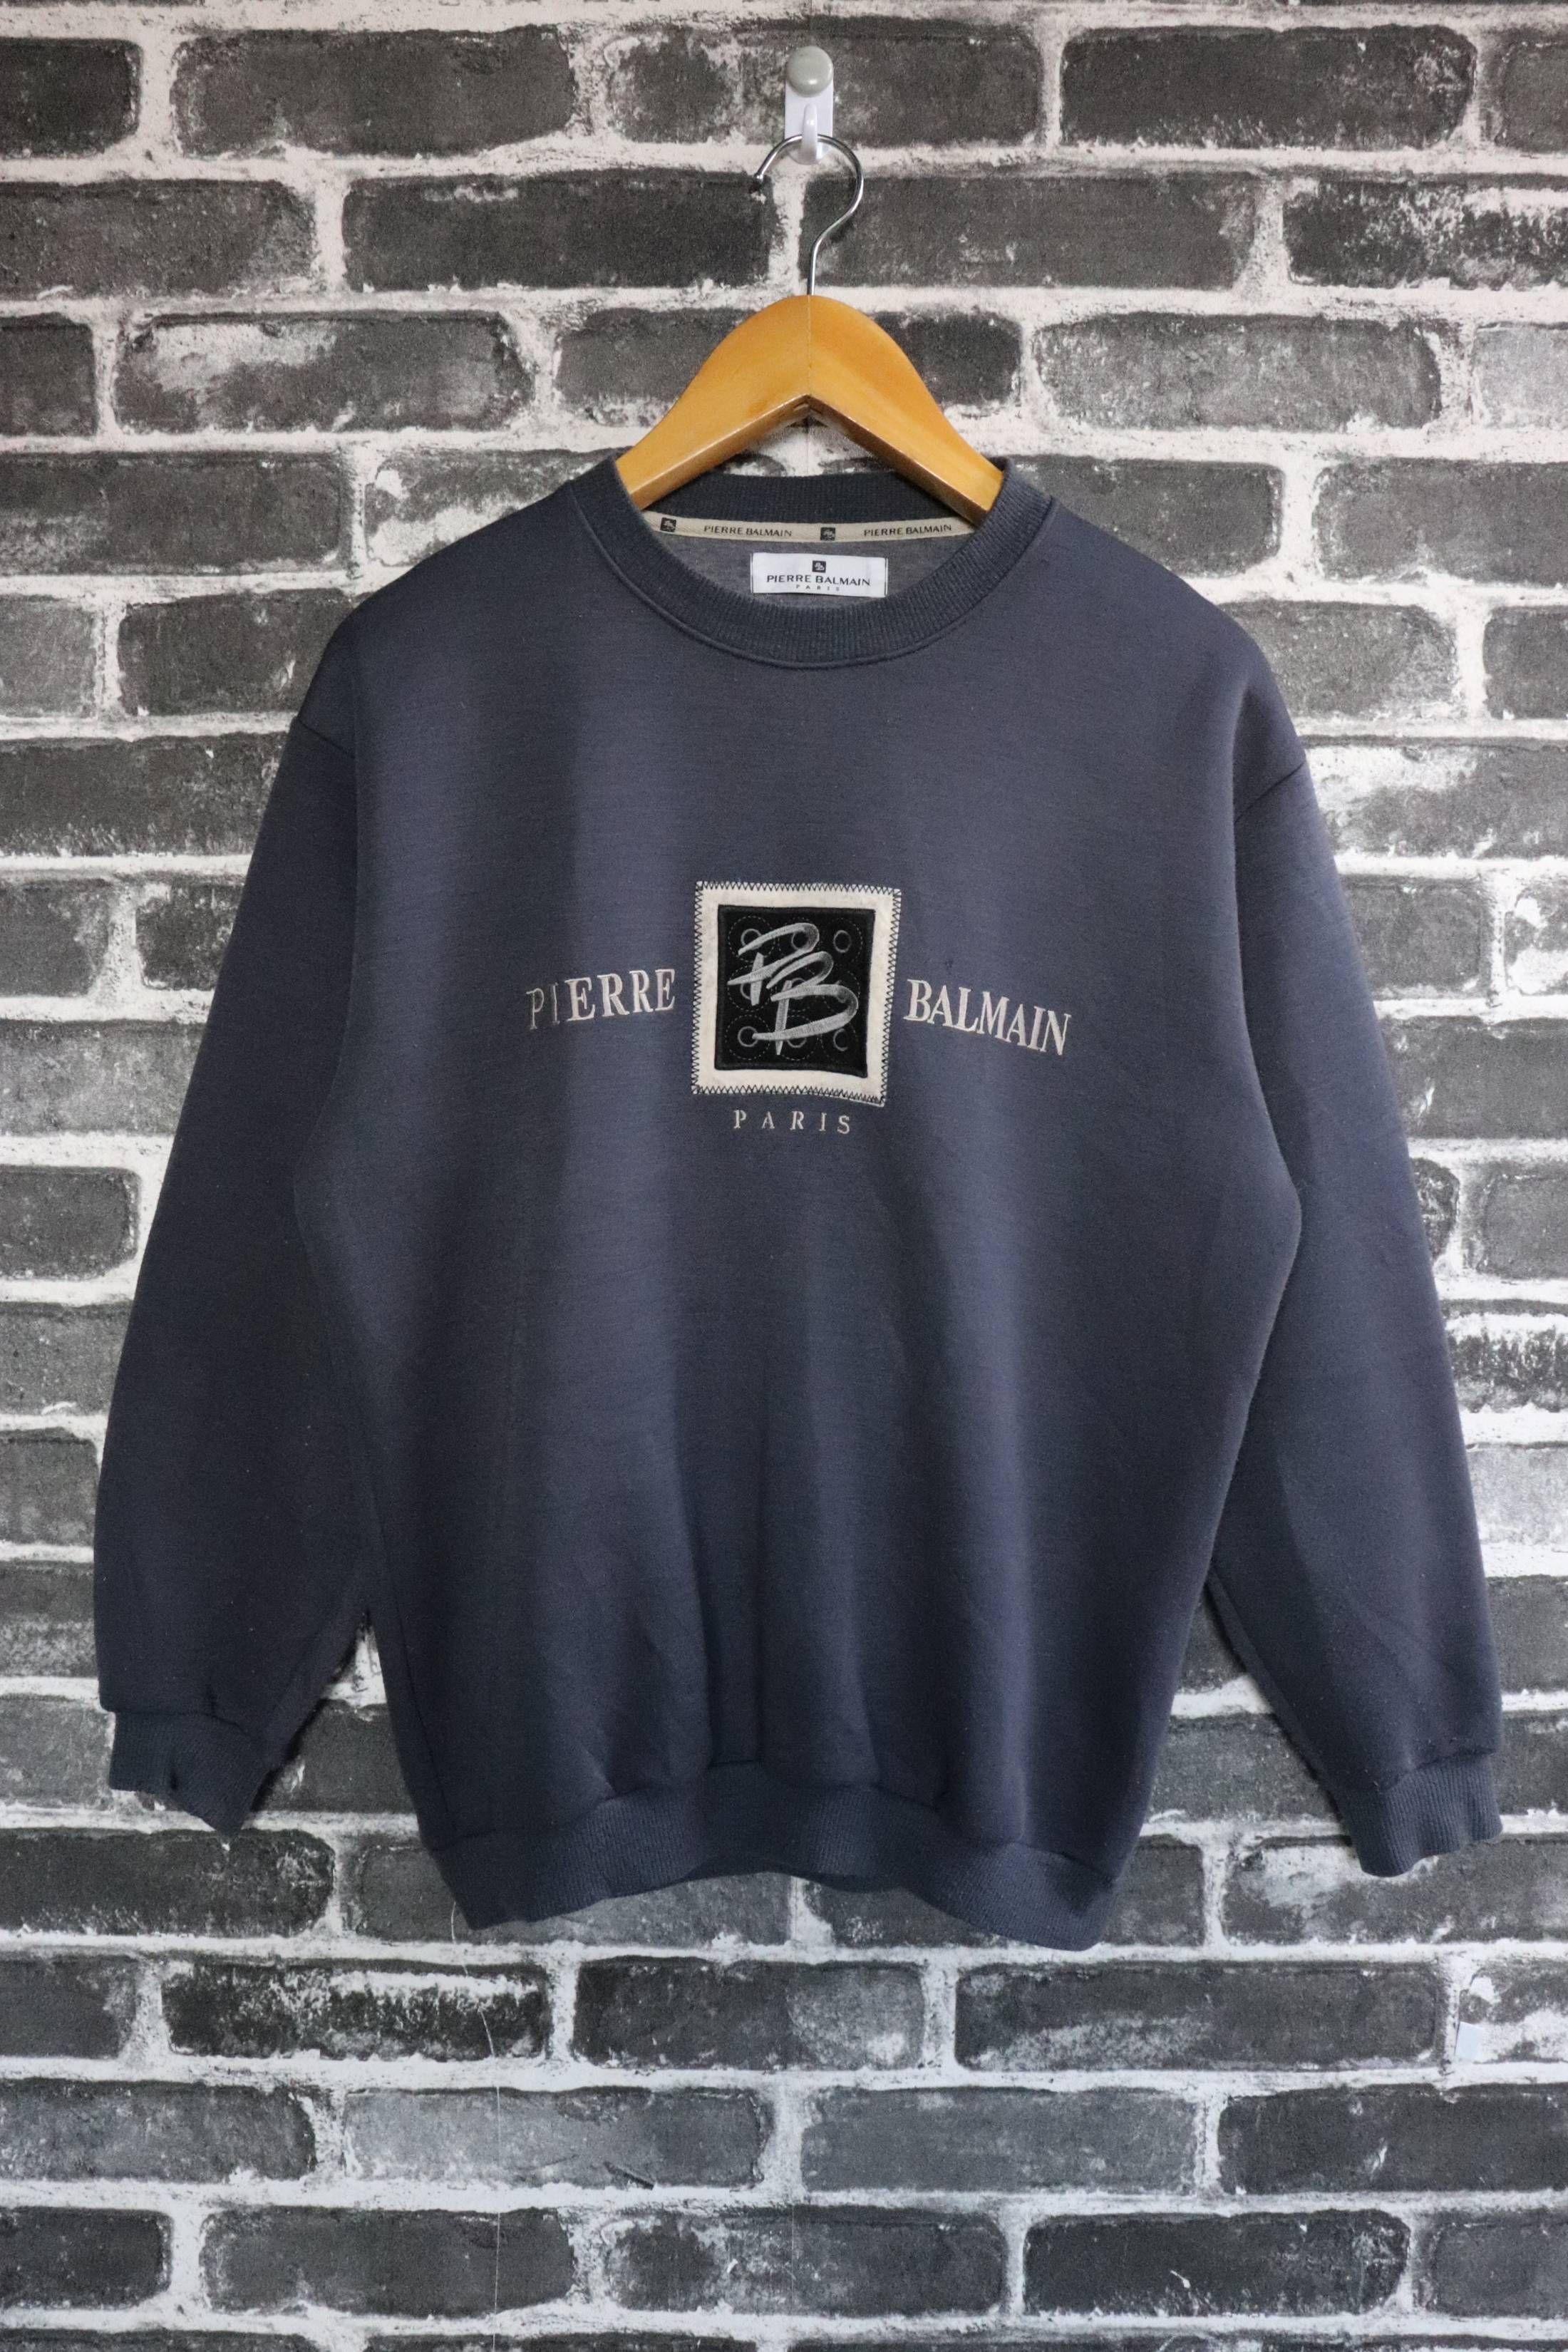 6223d5e4ac Pierre Balmain Pierre Balmain PARIS Vintage Sweatshirts Crew neck pullover  Authentic Runway Dark Big Box Logo Embroidery Street wear/fashion wear Size  M ...